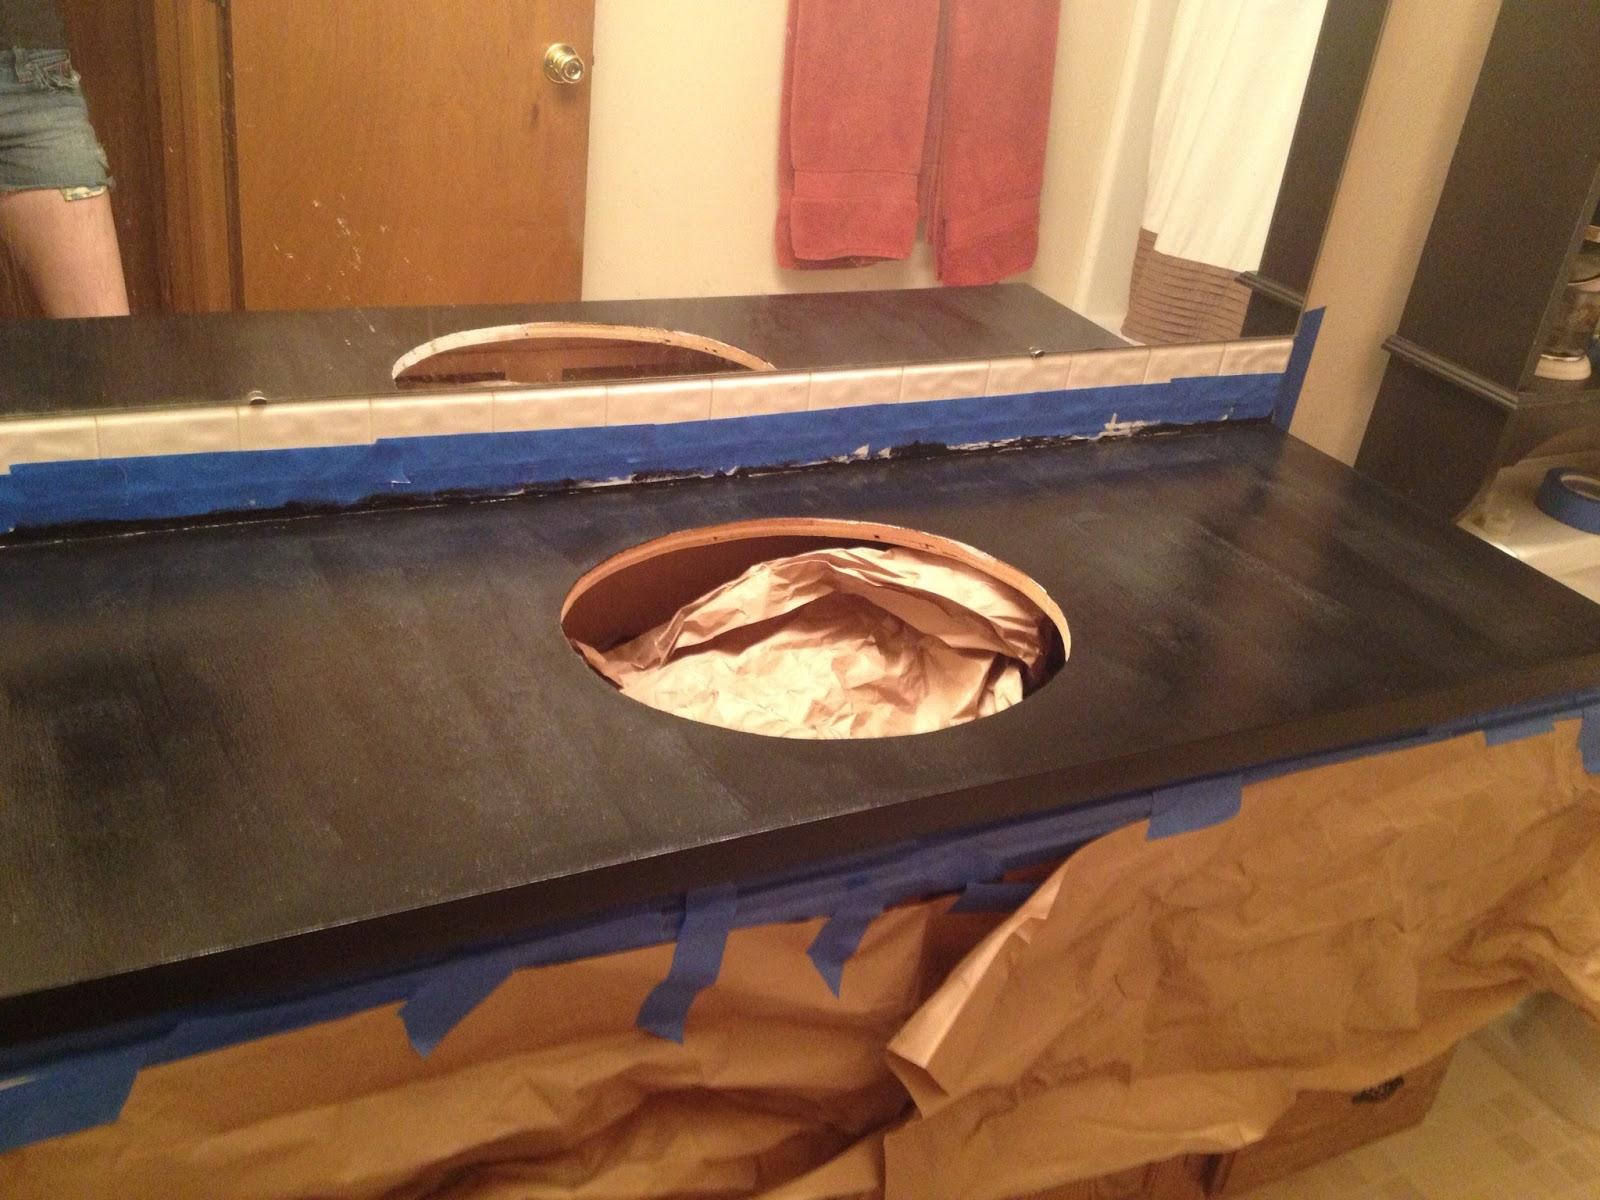 Metallic Countertop Paint : step 3 black paint step four sponge on metallic paint